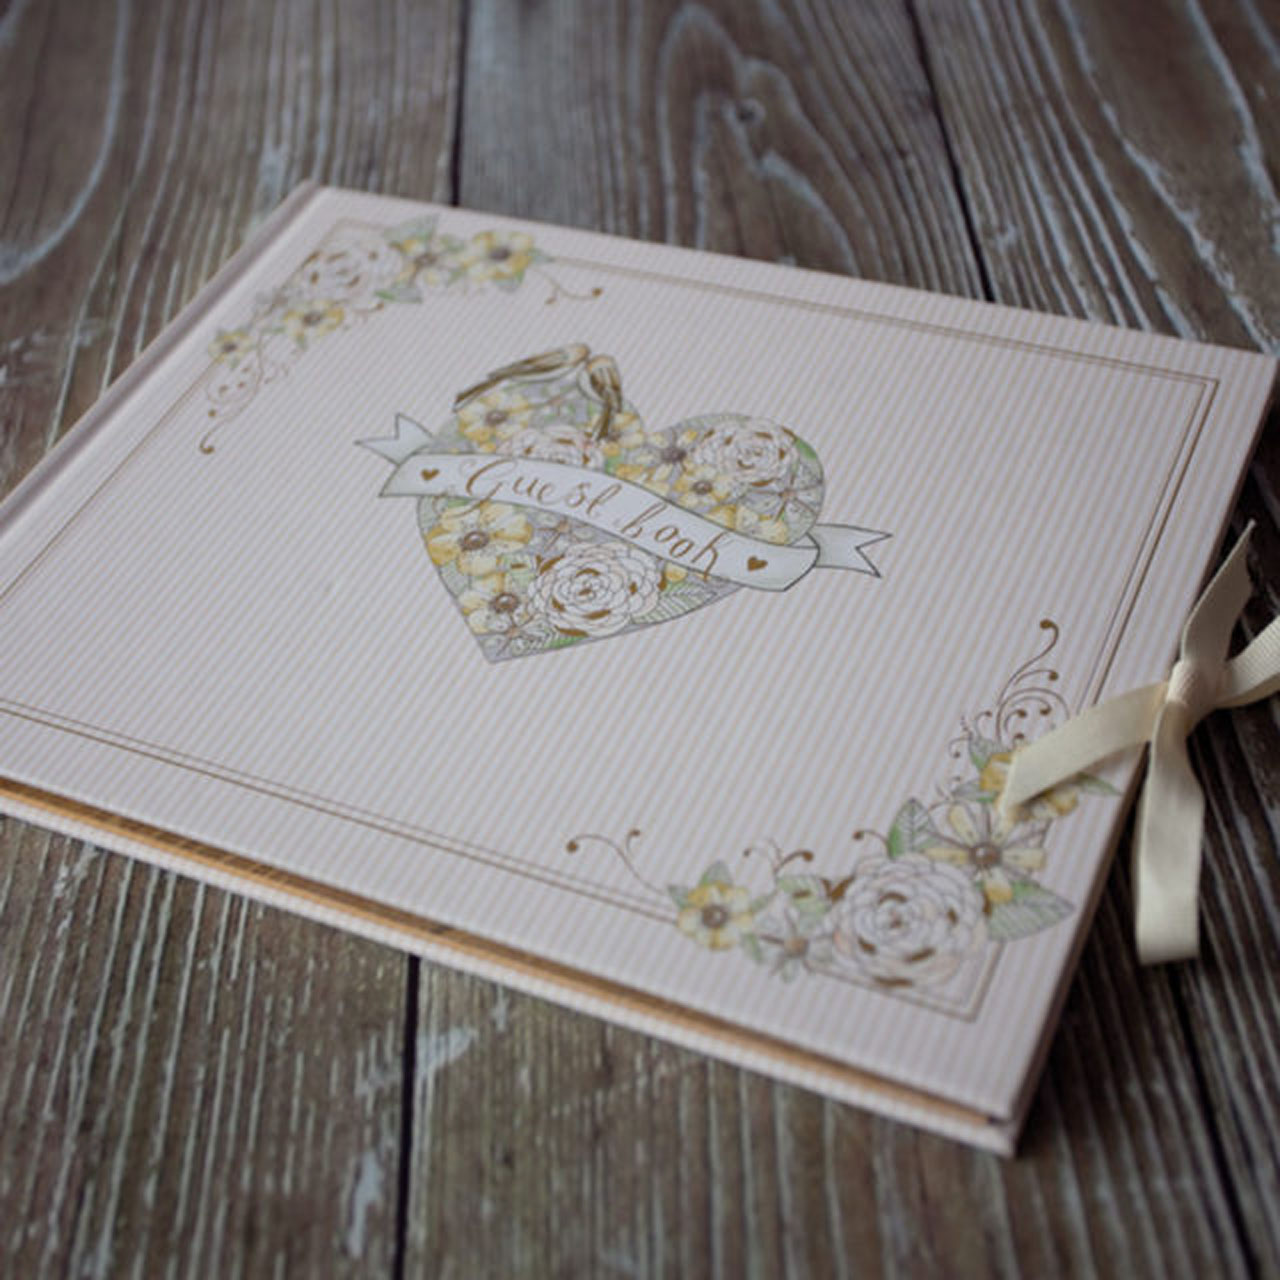 WDGUEST1-wedding-guest-book-lifestyle-1-1-640x640